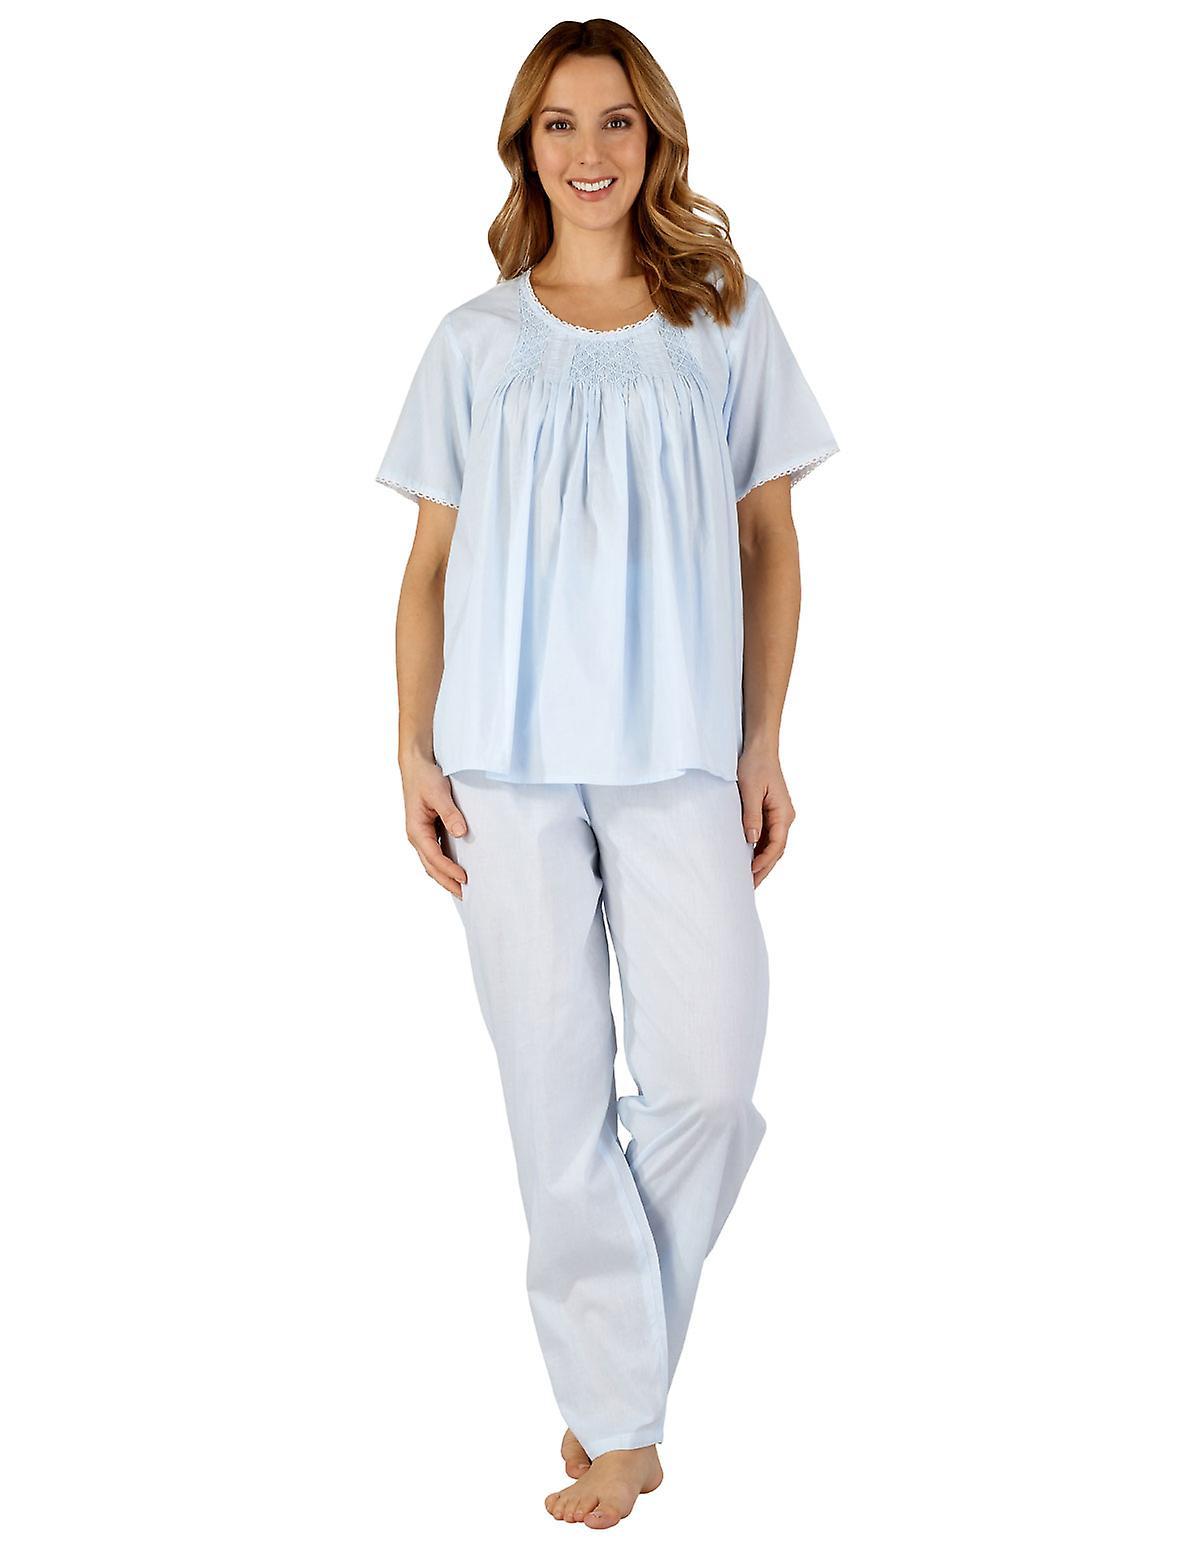 Slenderella PJ3257 Women's Cotton Woven Pajama Pyjama Set